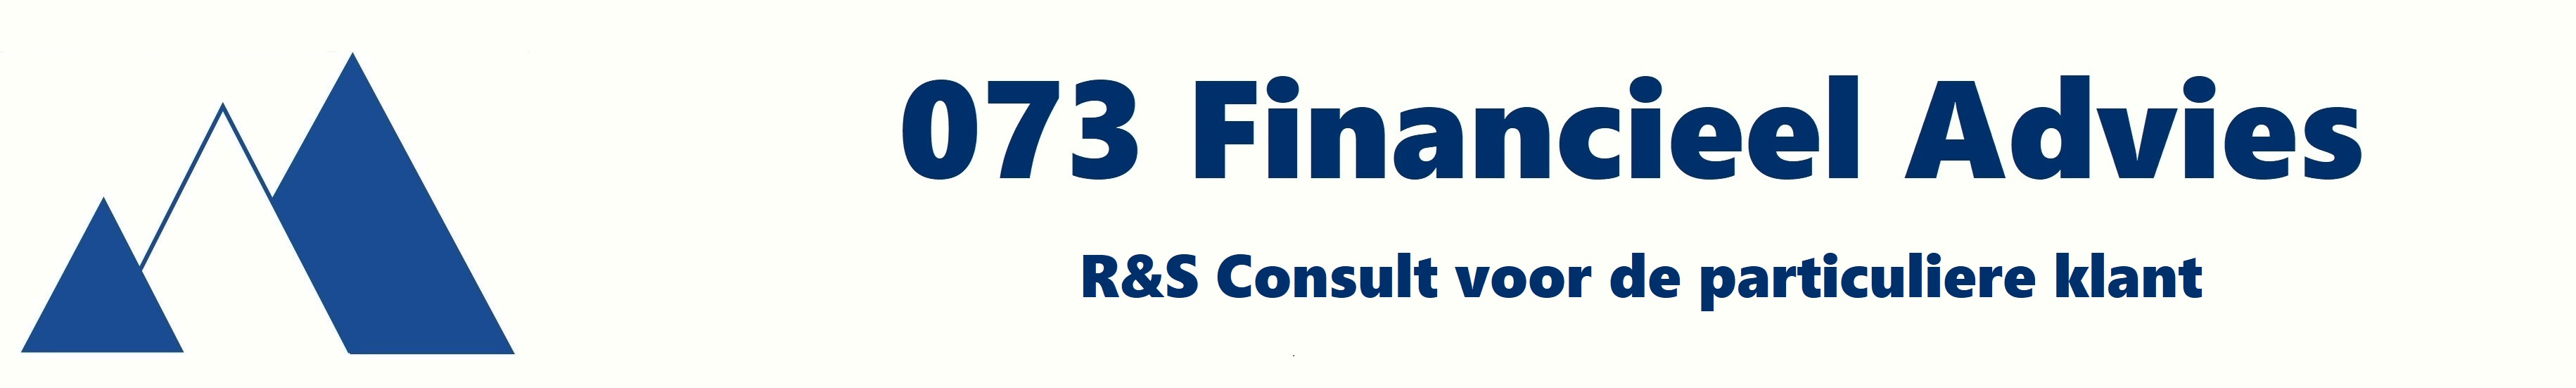 073 Financieel Advies